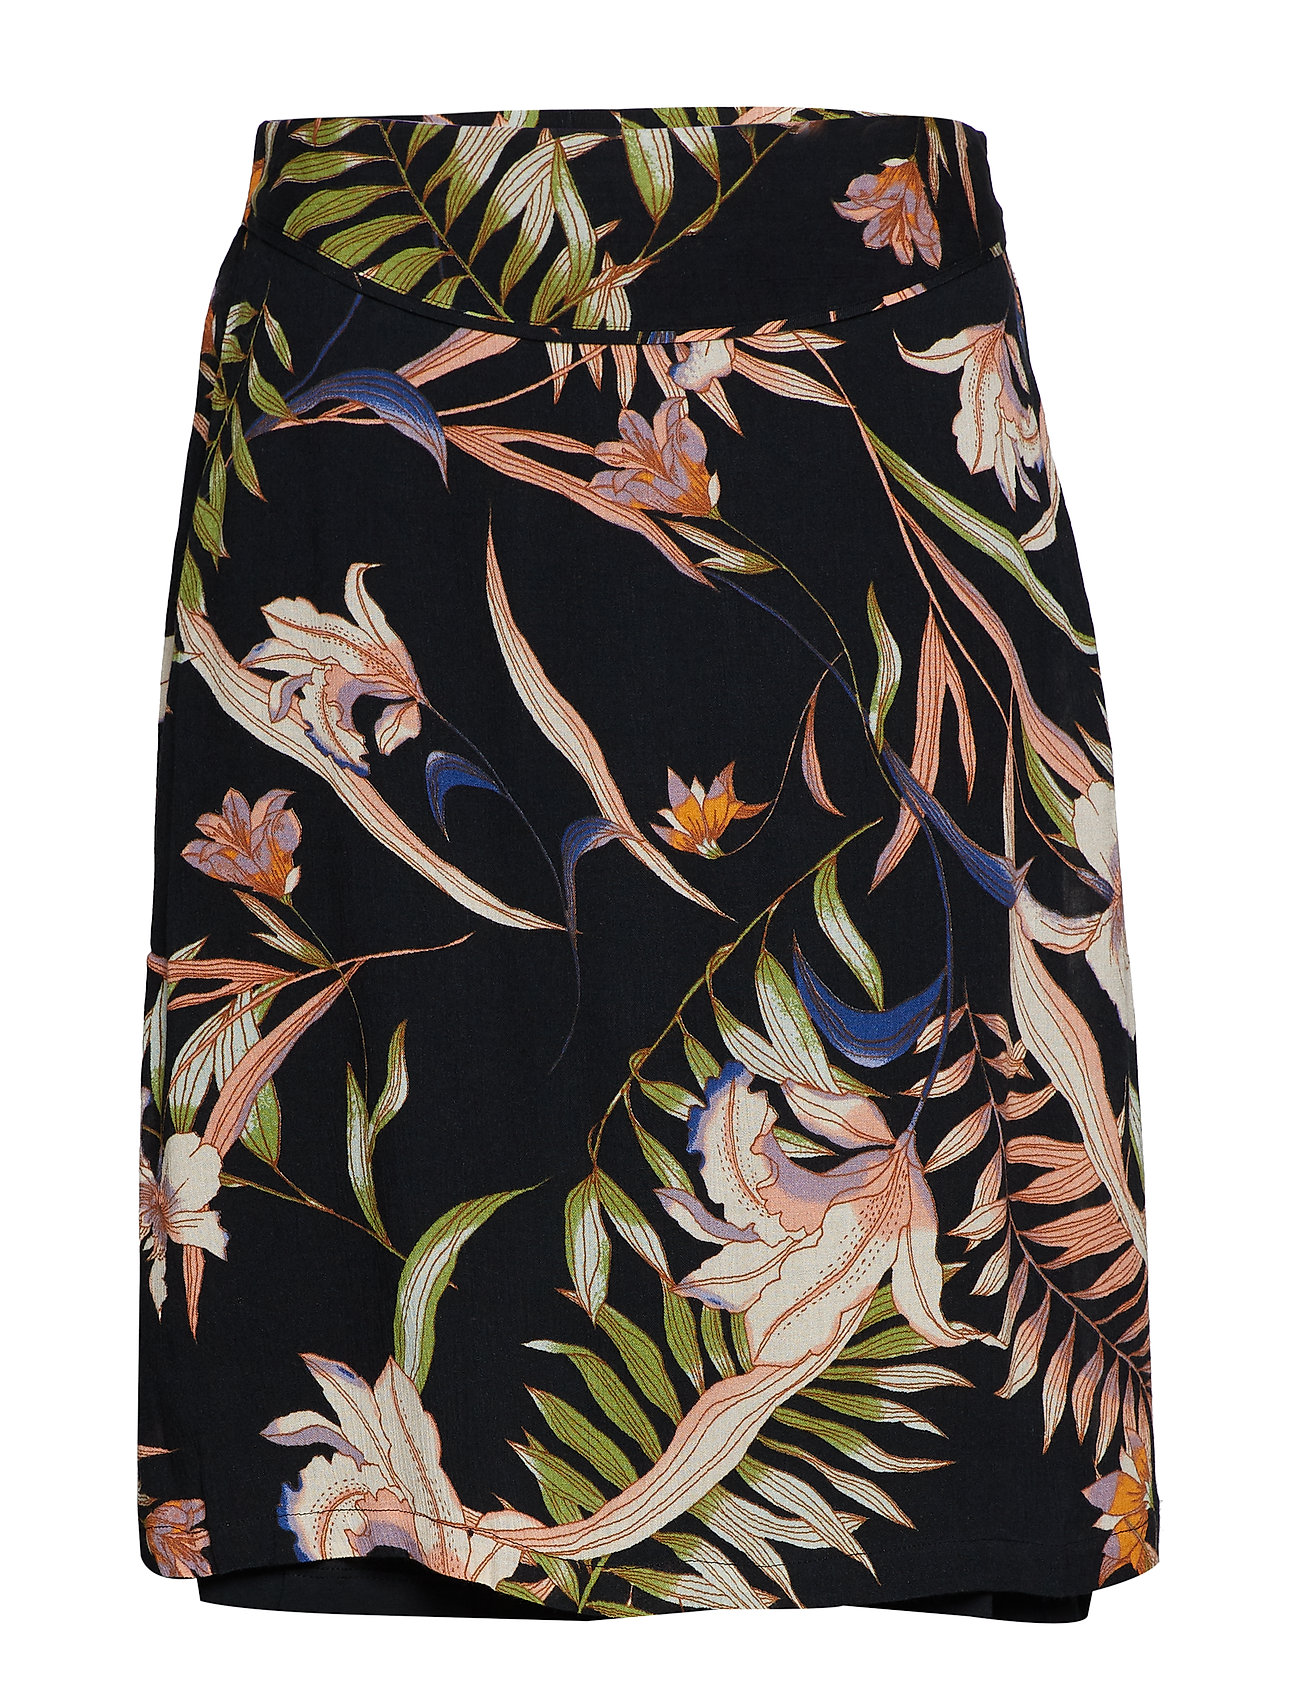 b2d66d90f80c Leann Skirt (Pitch Black) (399.20 kr) - Cream - | Boozt.com